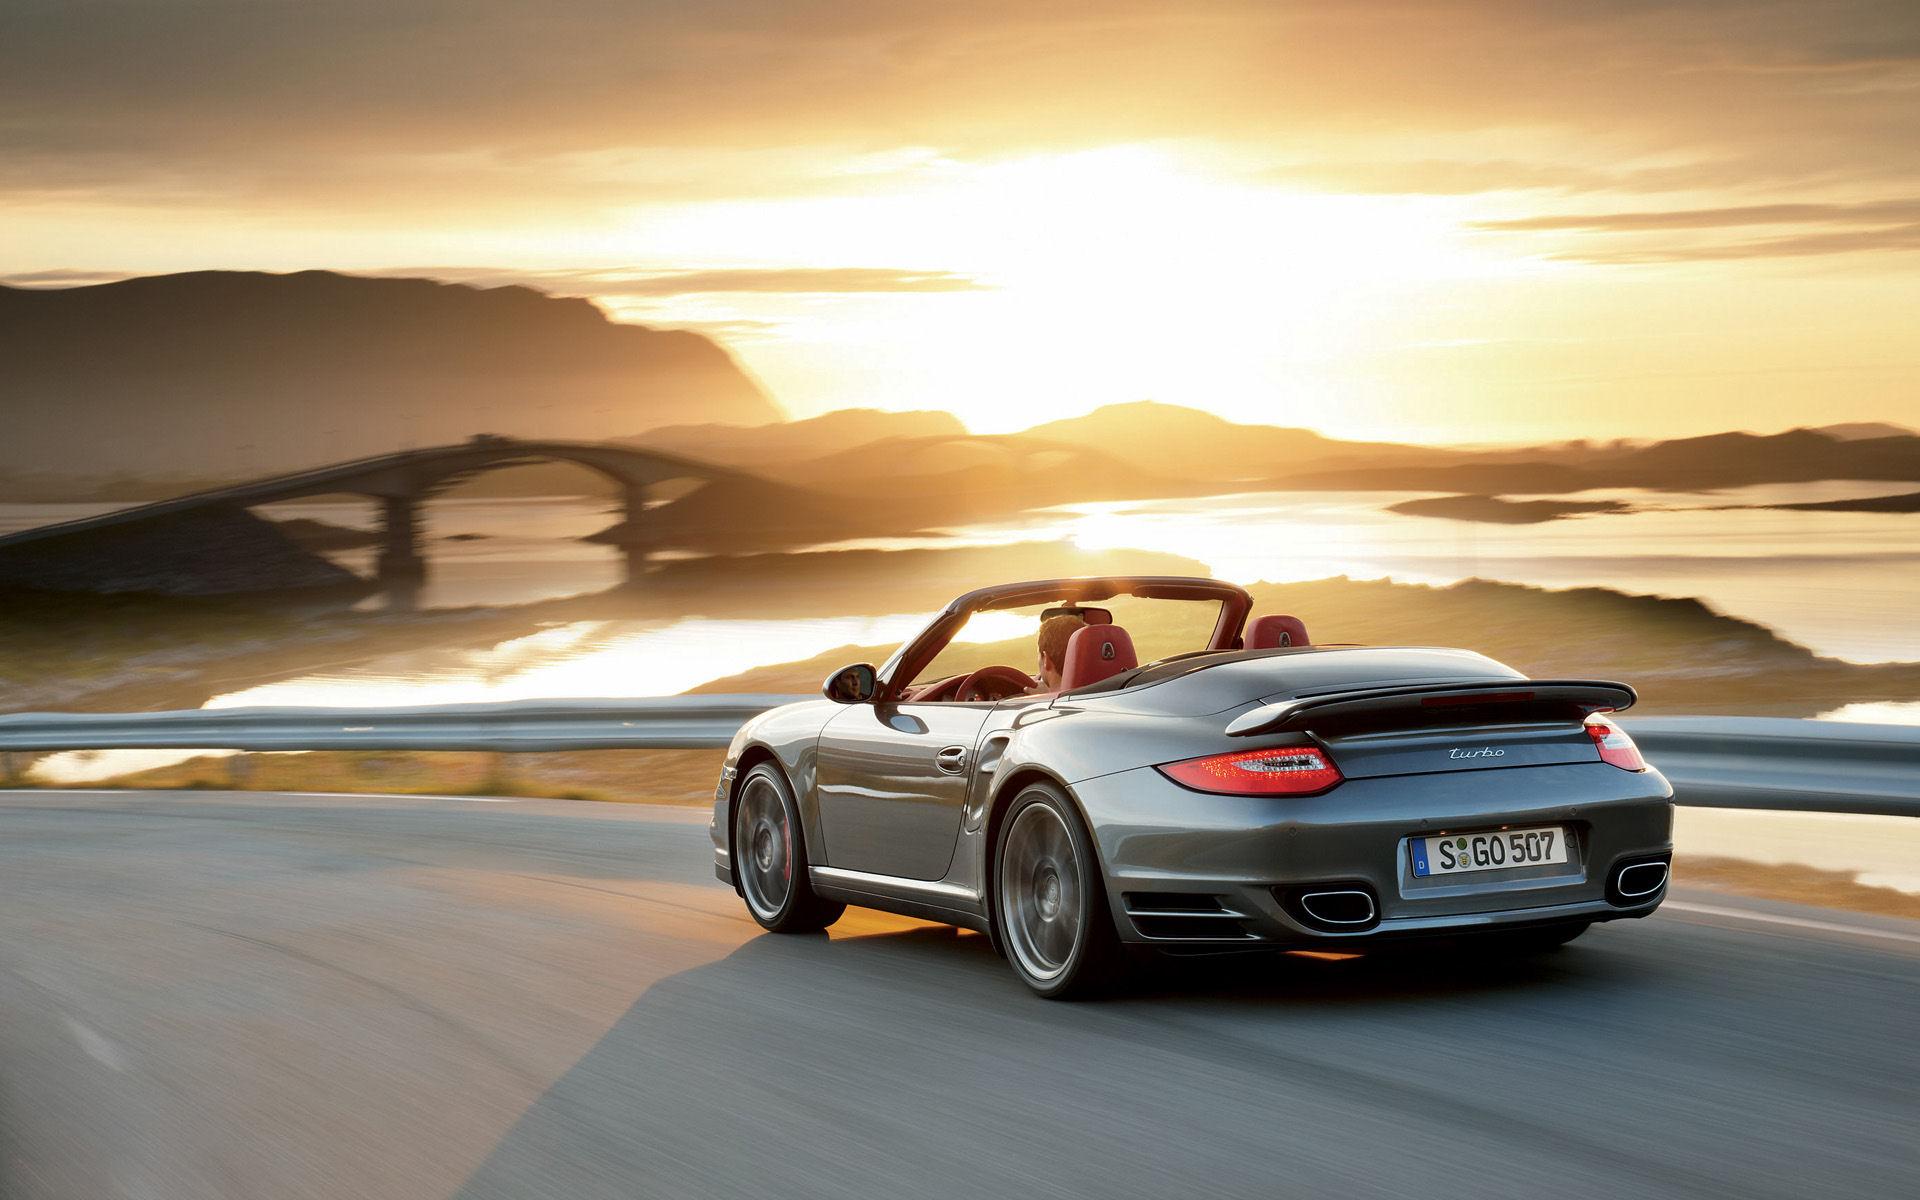 Porsche > Porsche 911 > Porsche 911 Desktop Wallpapers > Widescreen ...